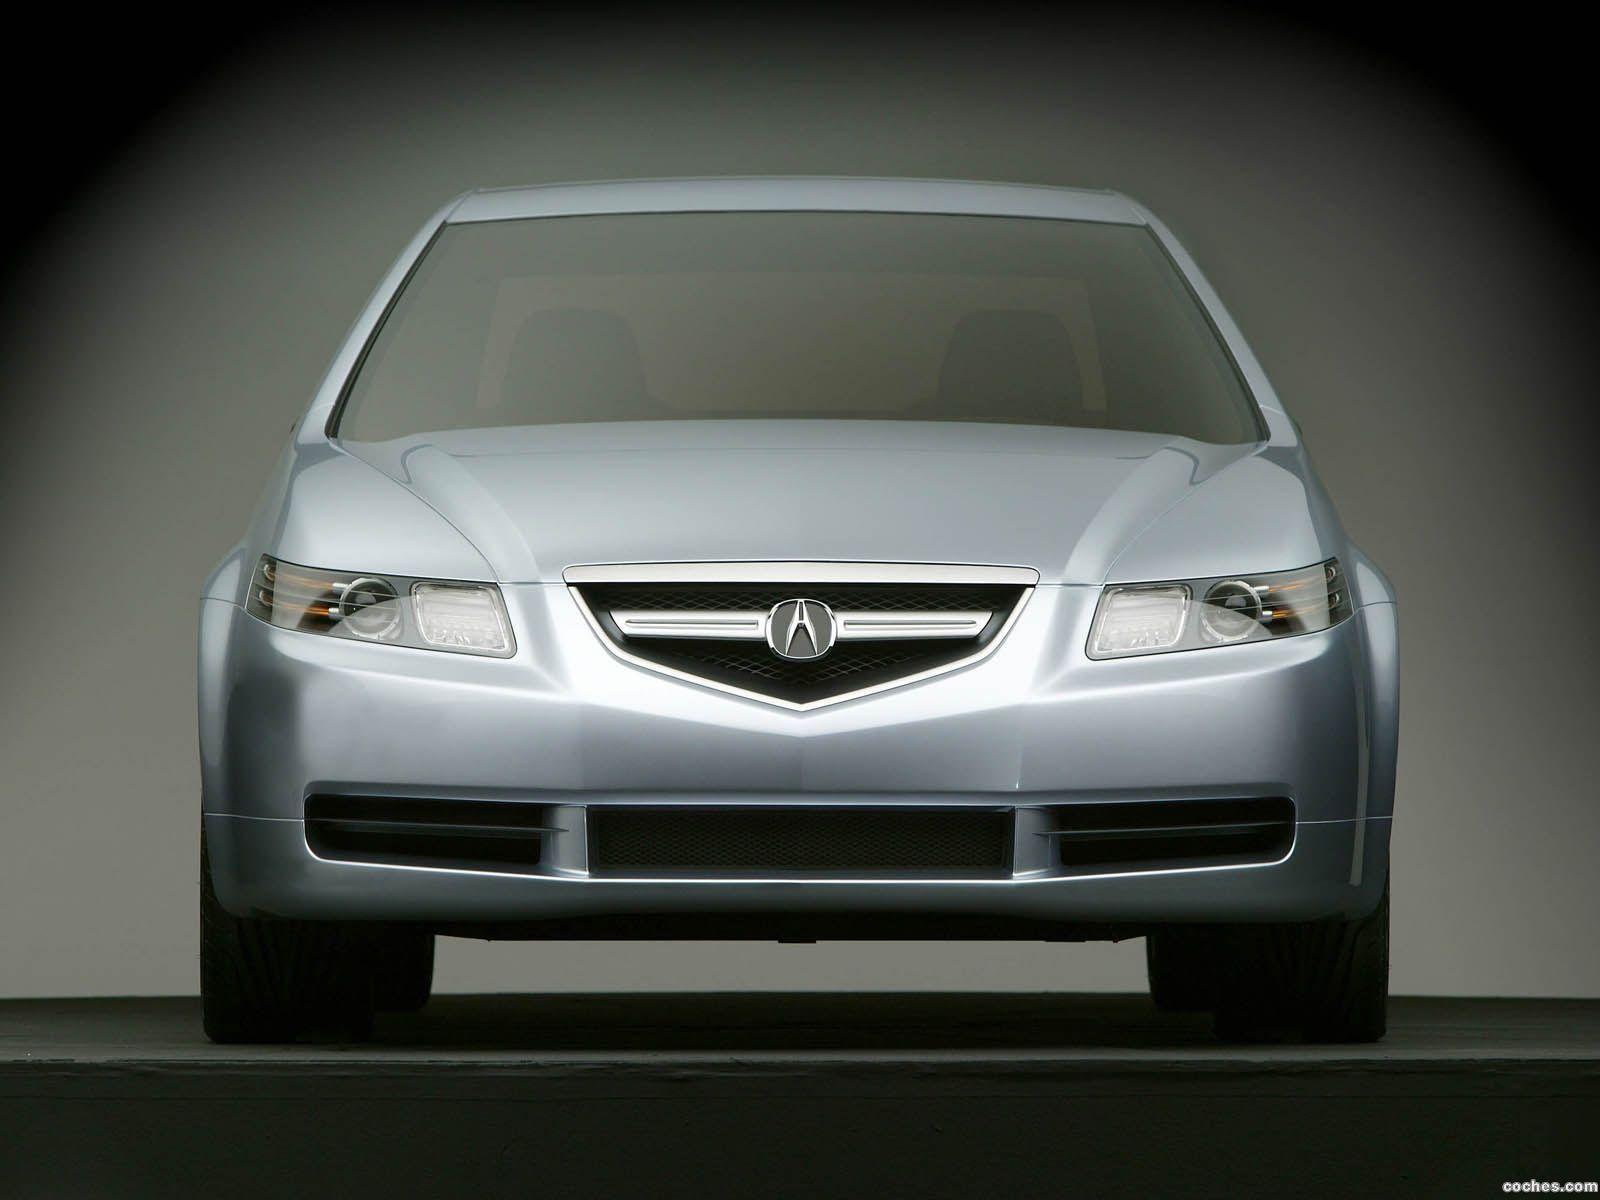 Foto 2 de Acura TL Concept 2003